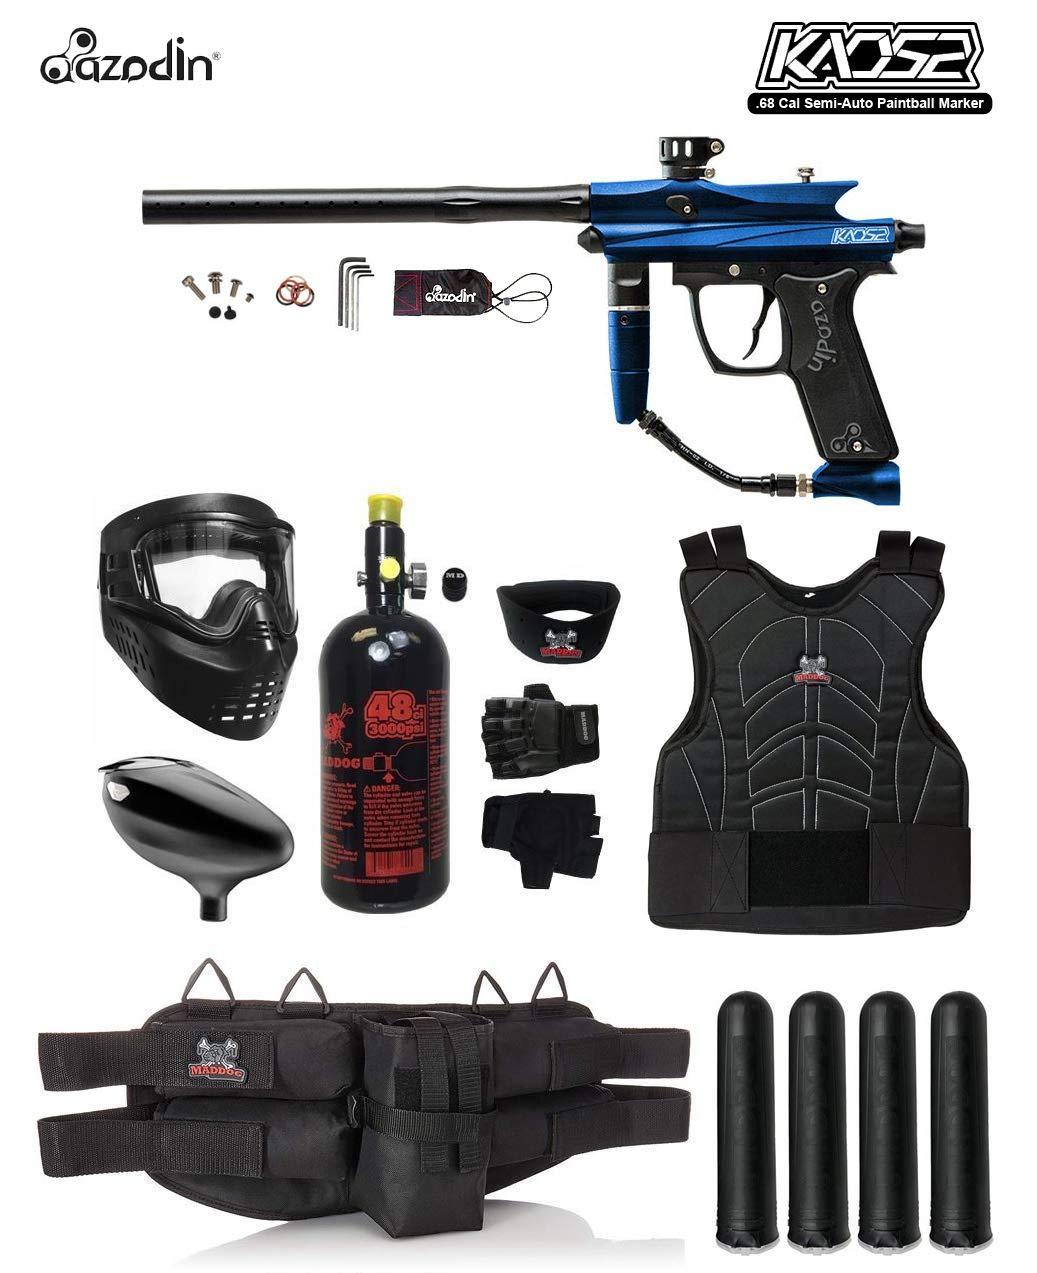 MAddog Azodin KAOS 2 Starter Protective HPA Paintball Gun Package - Blue/Black